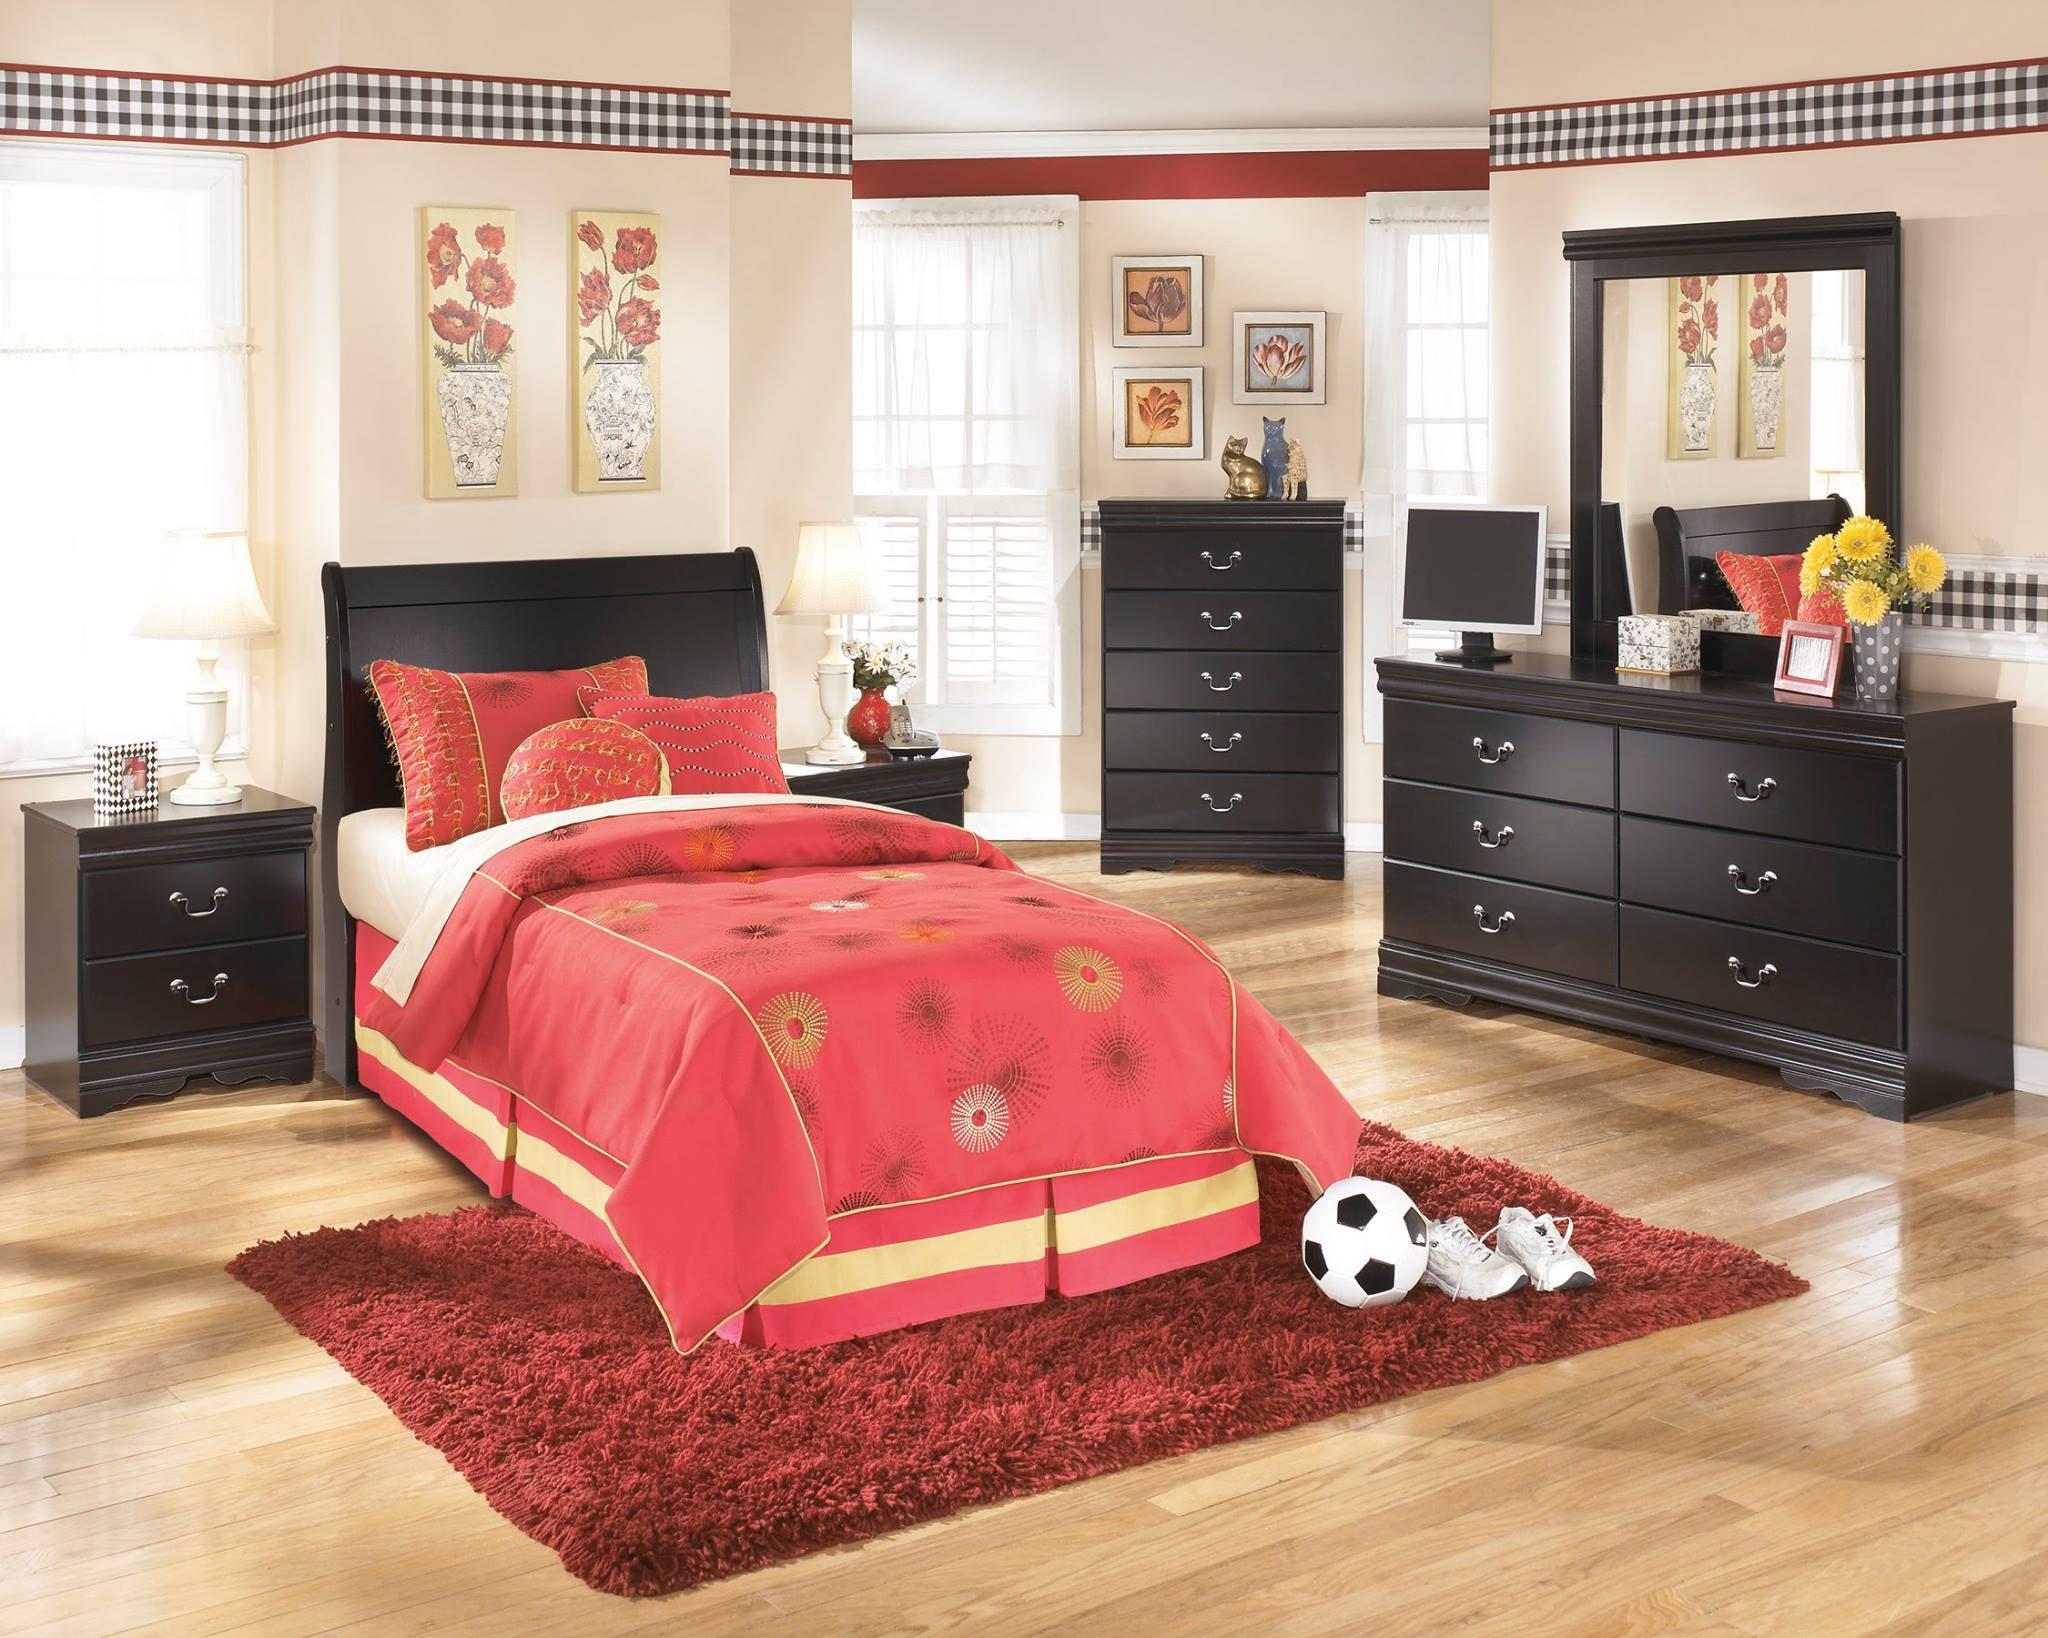 Newton  NJ 07860. Home Furniture Warehouse in Newton  NJ    973  579 1